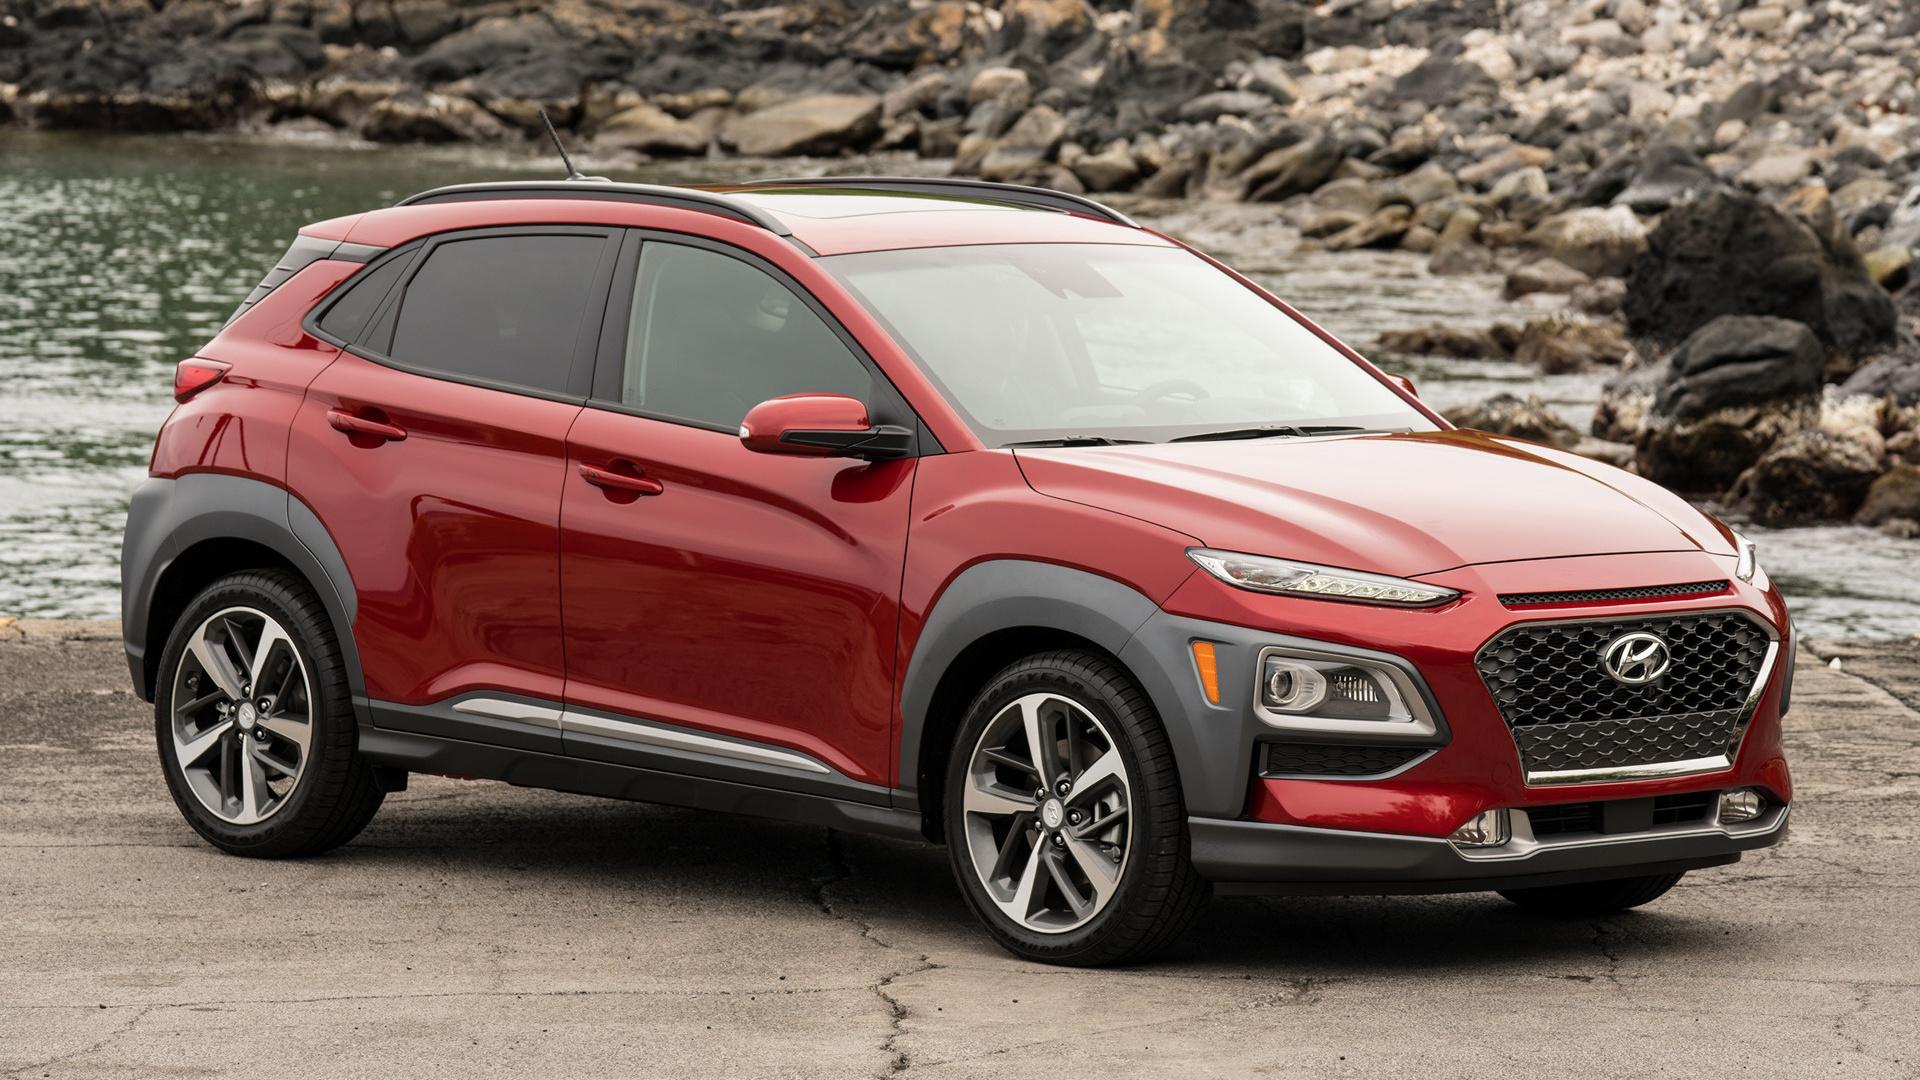 2018 Hyundai Kona (US) - Wallpapers and HD Images | Car Pixel